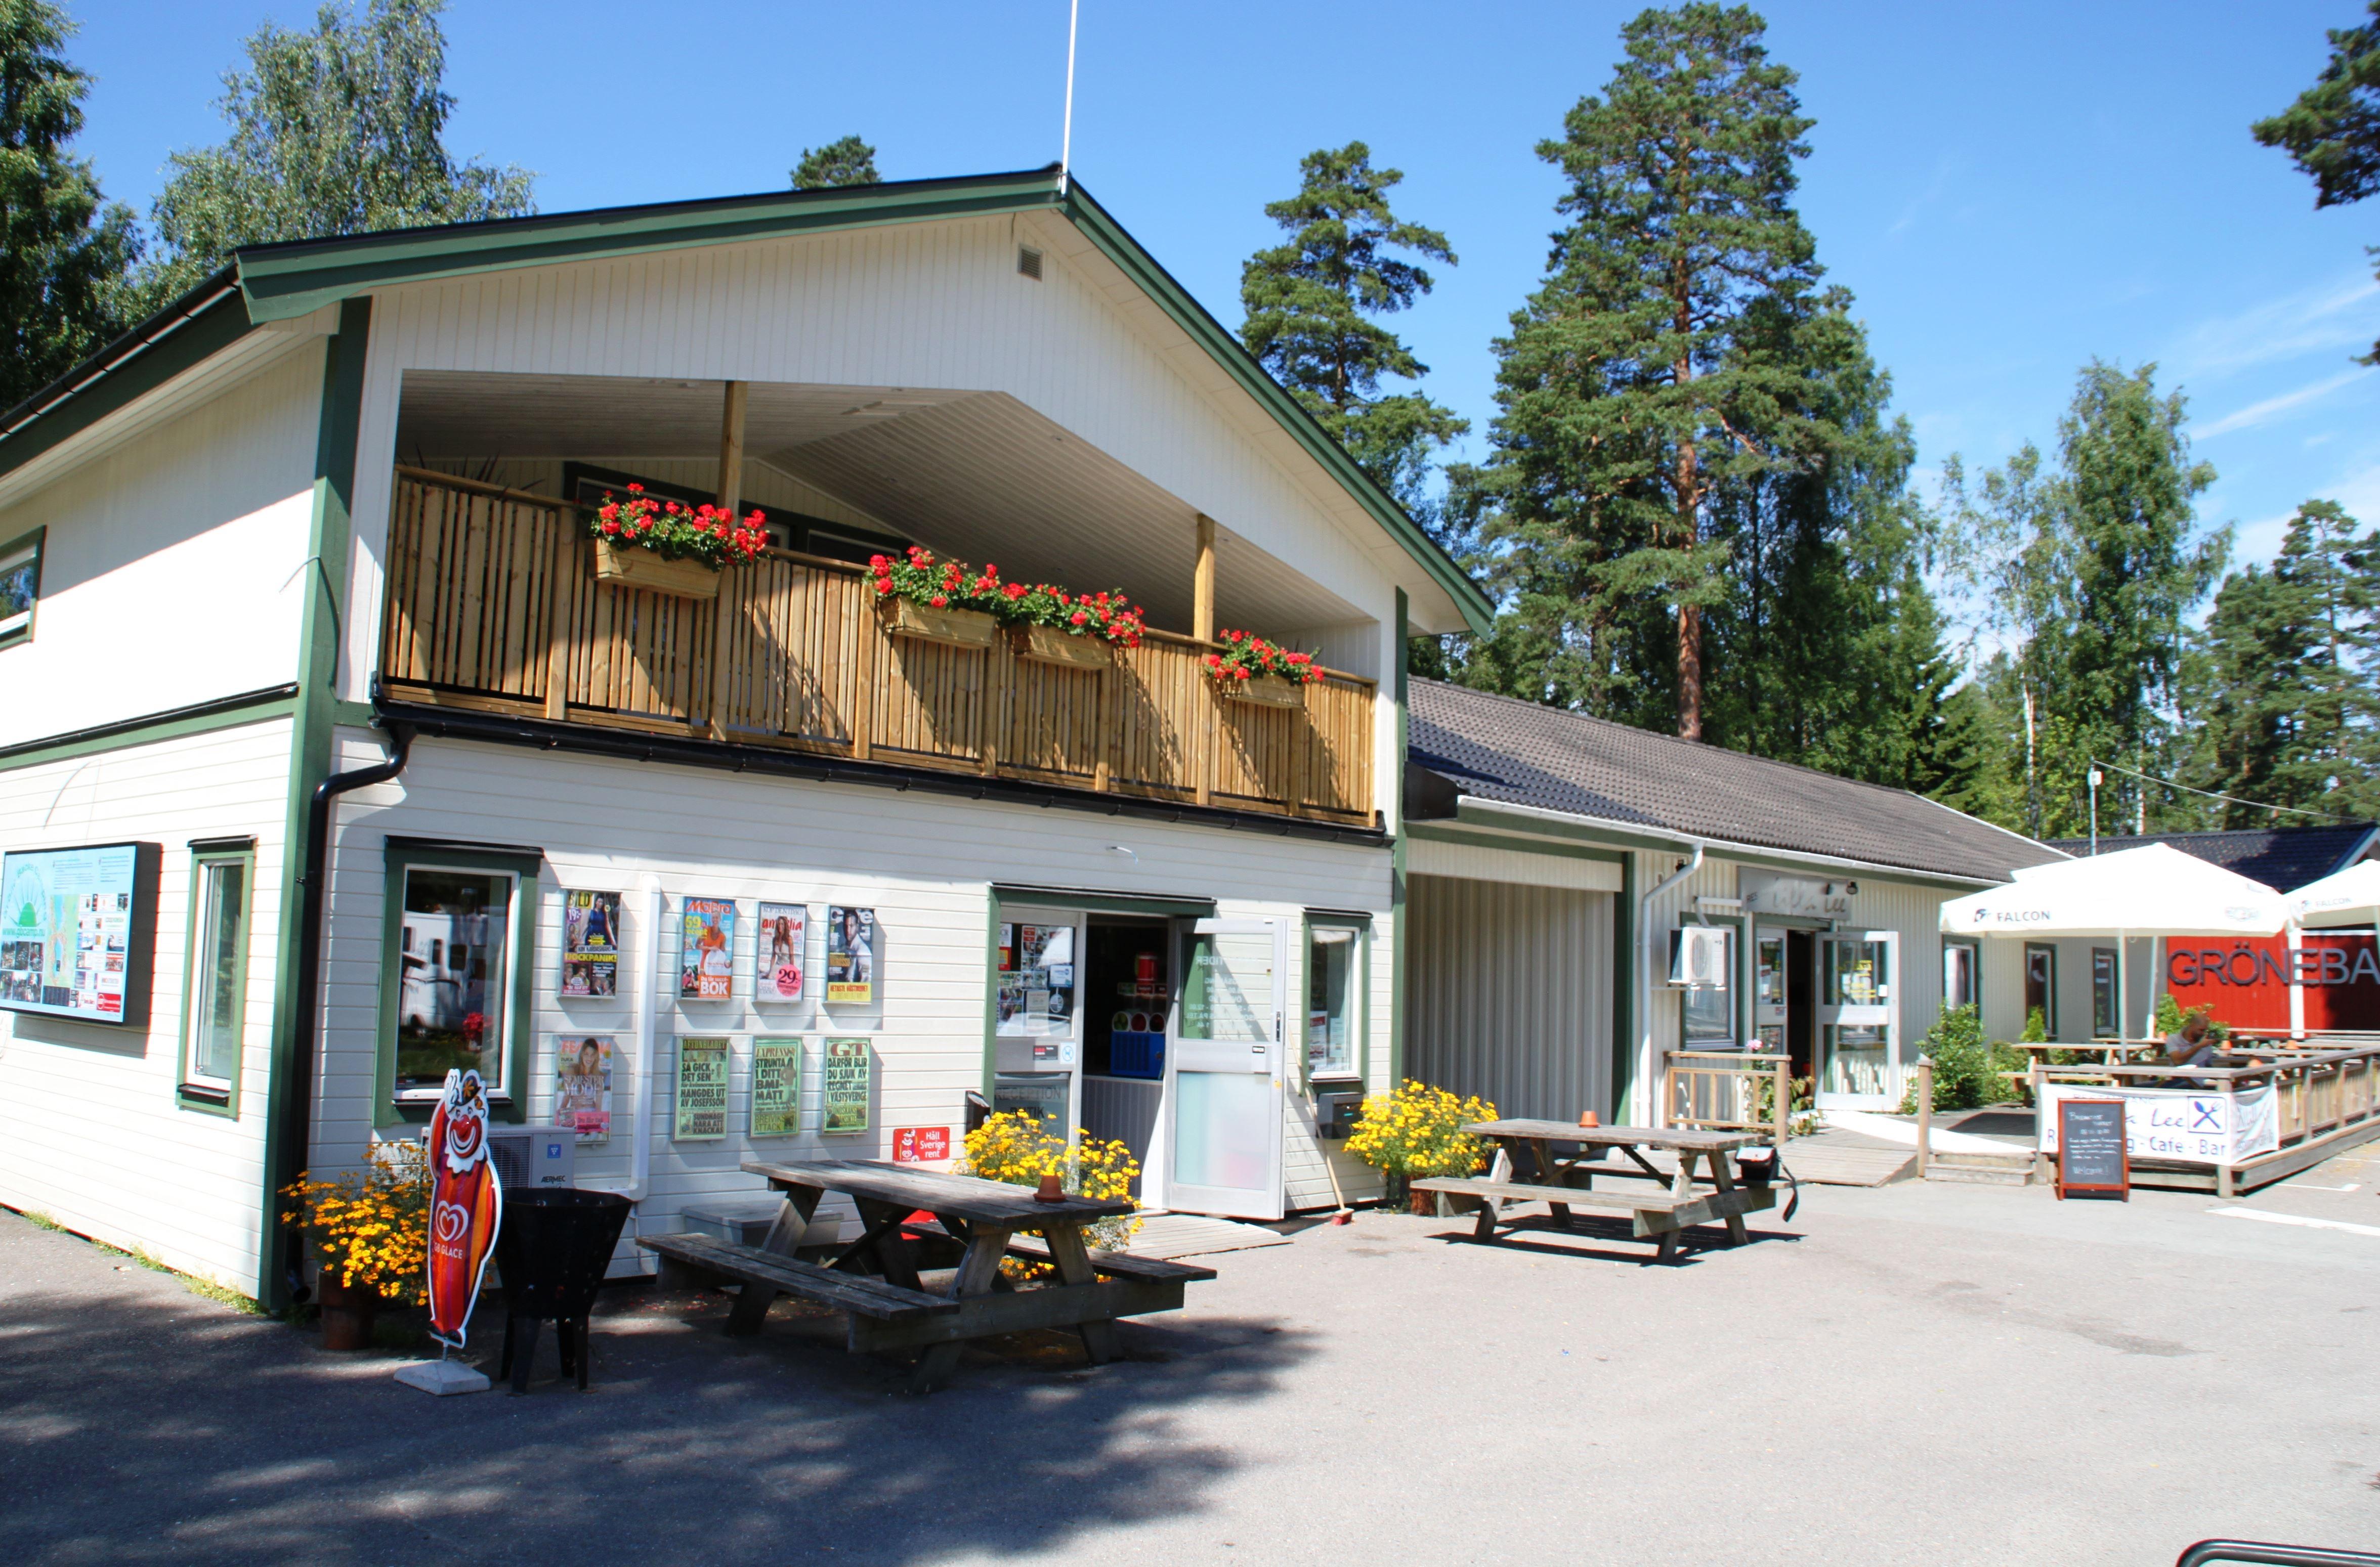 Gröne Backe Camping & Stugor/Camping